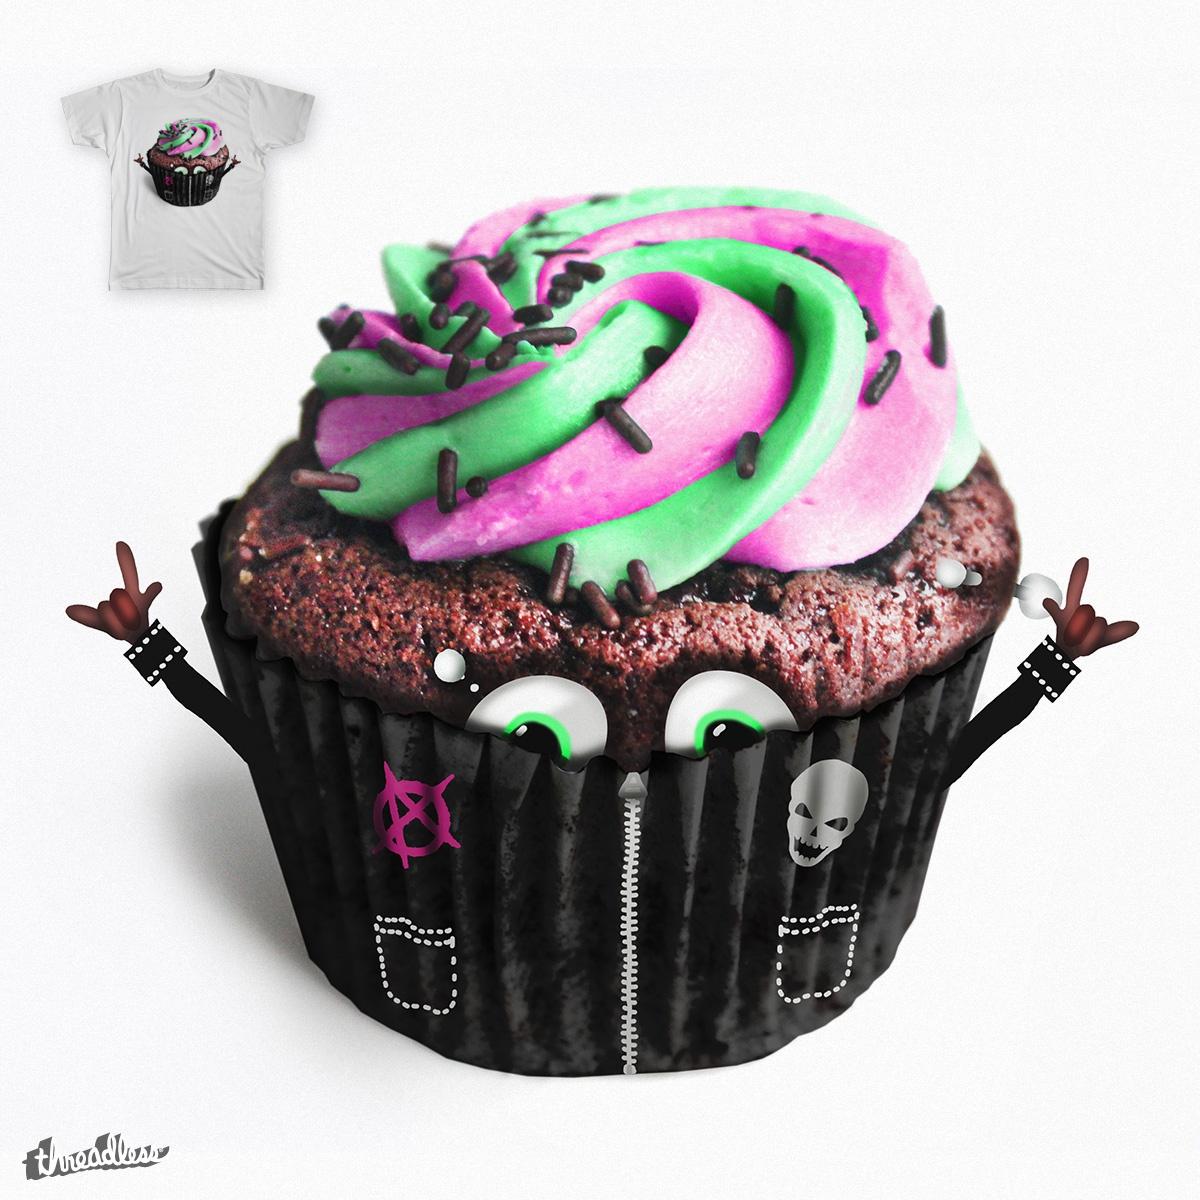 Punk cupcake! by Supabean on Threadless